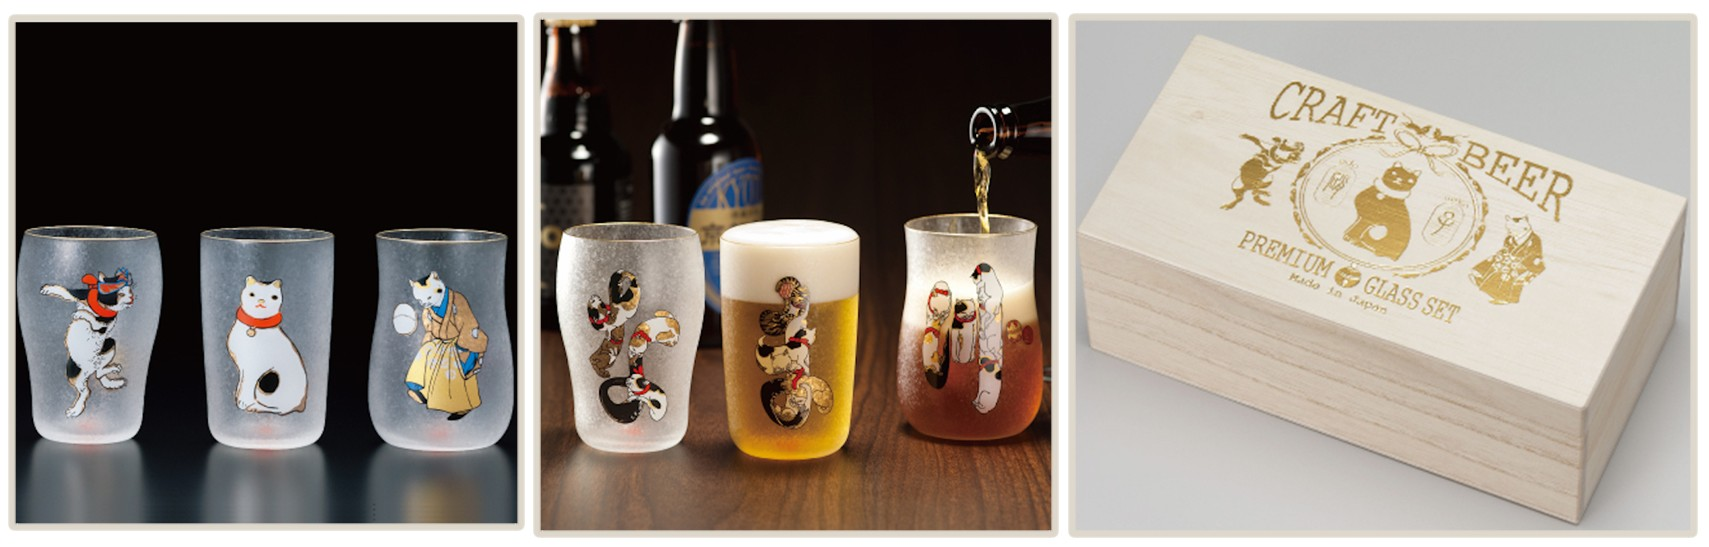 Ukiyo-e Cat Beer Glasses